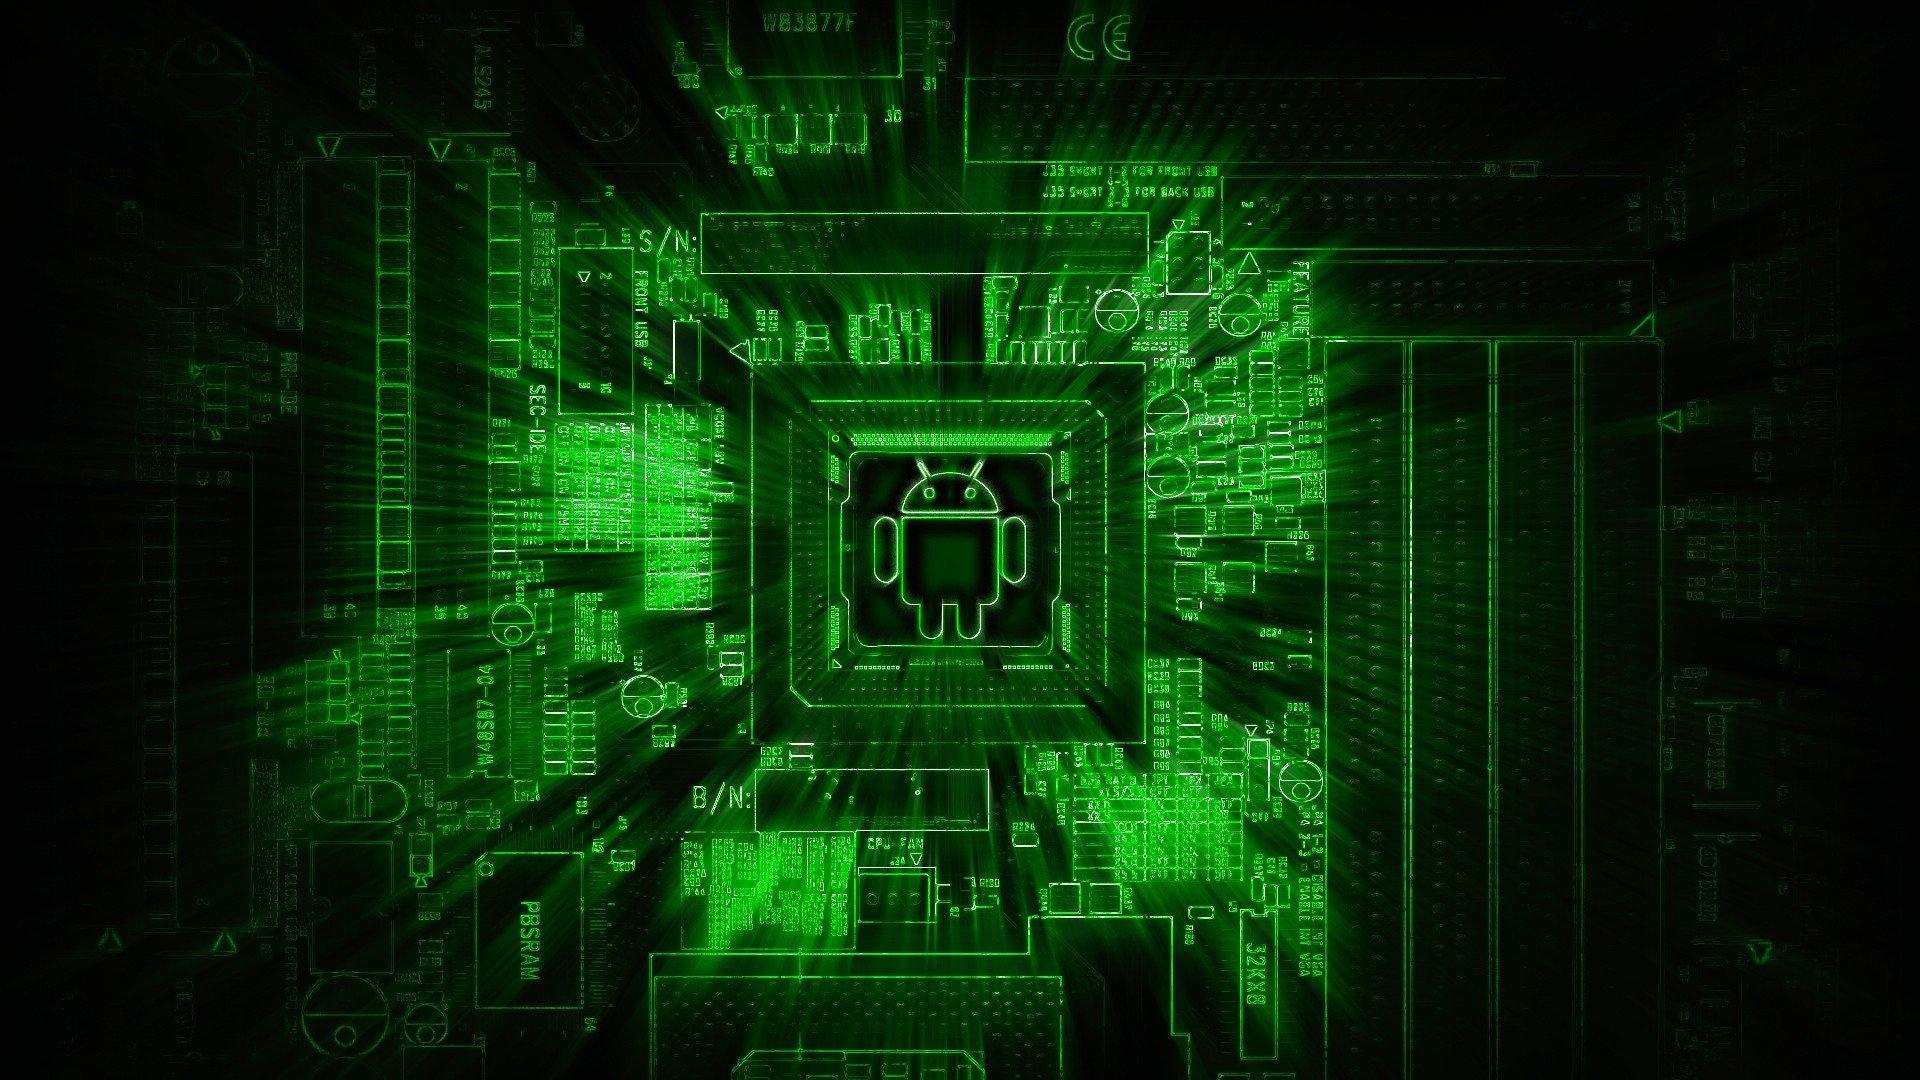 Google случайно распространила вирус на4 млн телефонов андроид — Хакер